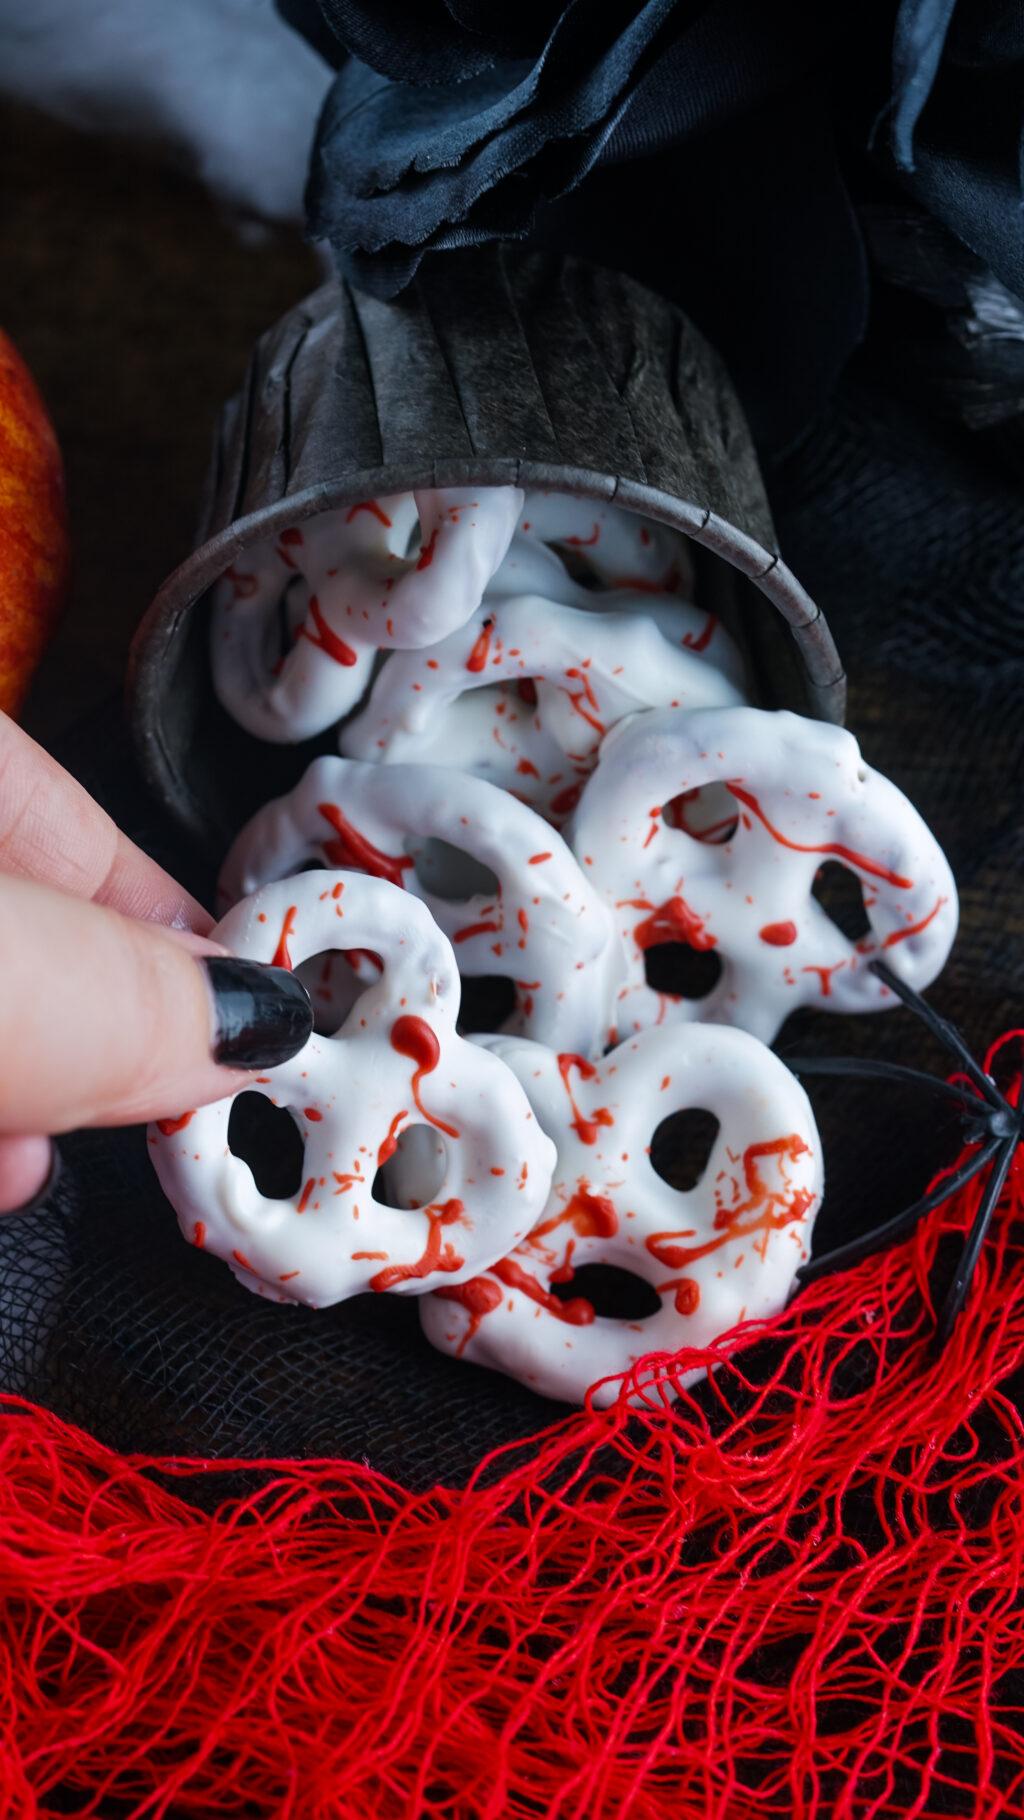 finger with black fingernail holding a bloody pretzel